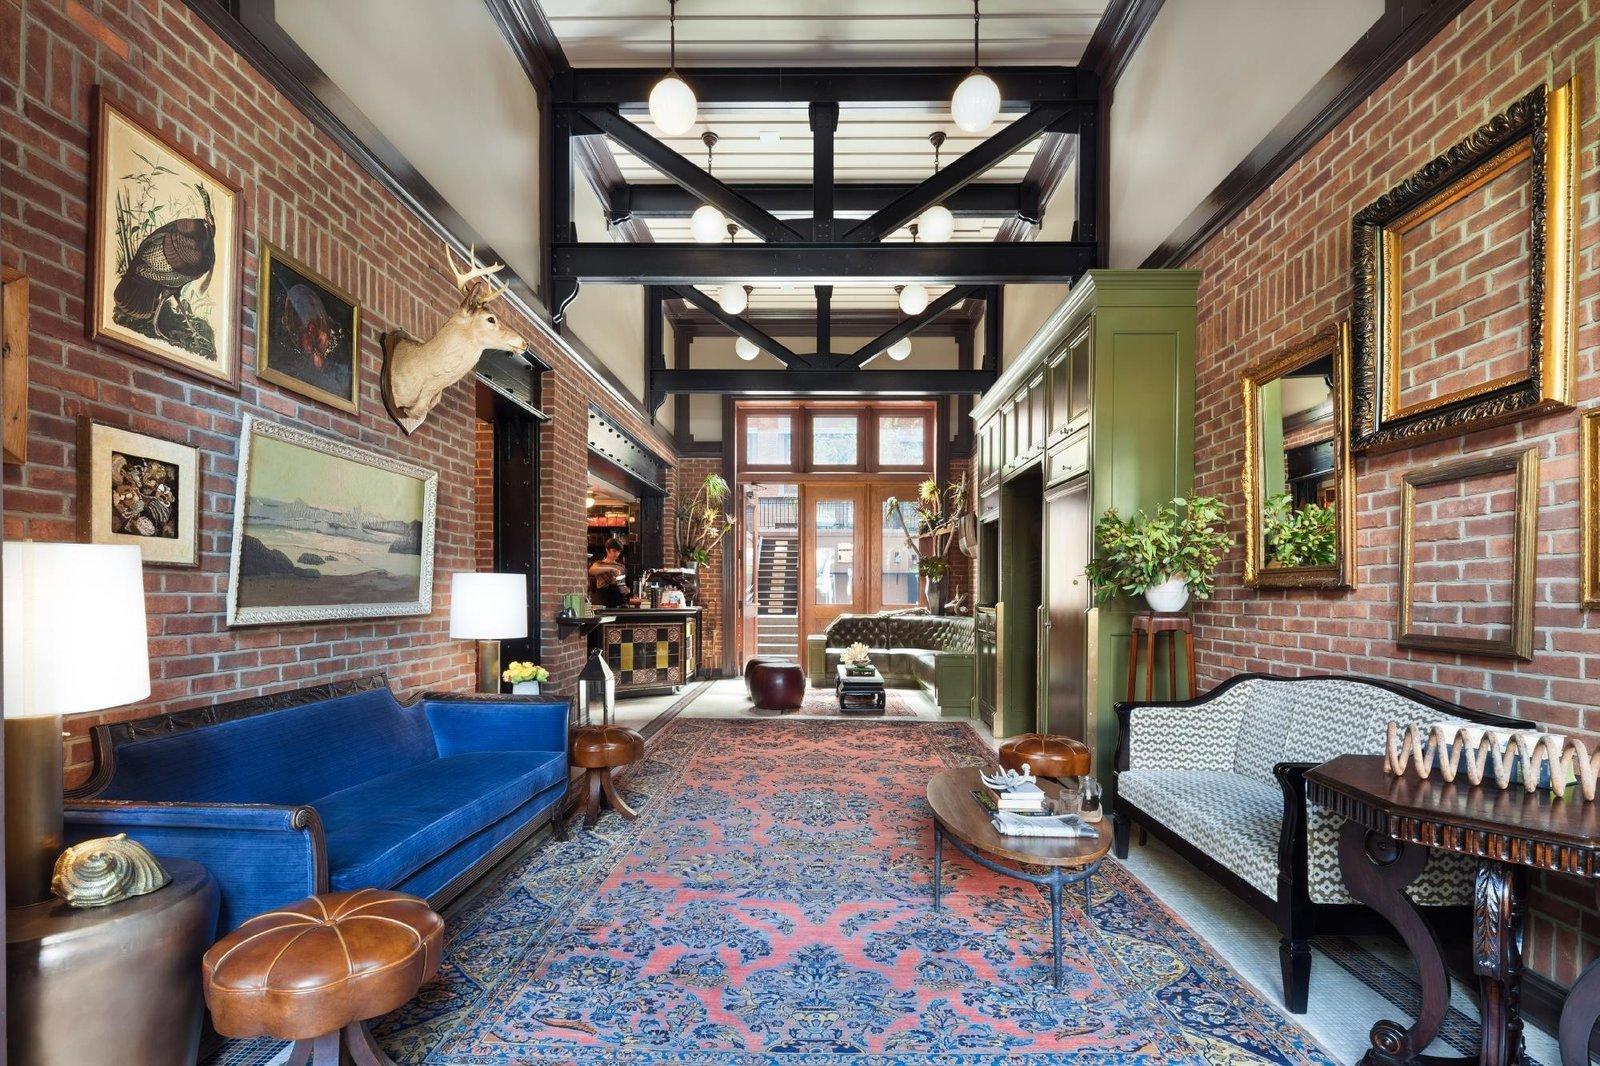 Living Room, Coffee Tables, Rug Floor, Stools, Pendant Lighting, Table Lighting, and Sofa  The High Line Hotel